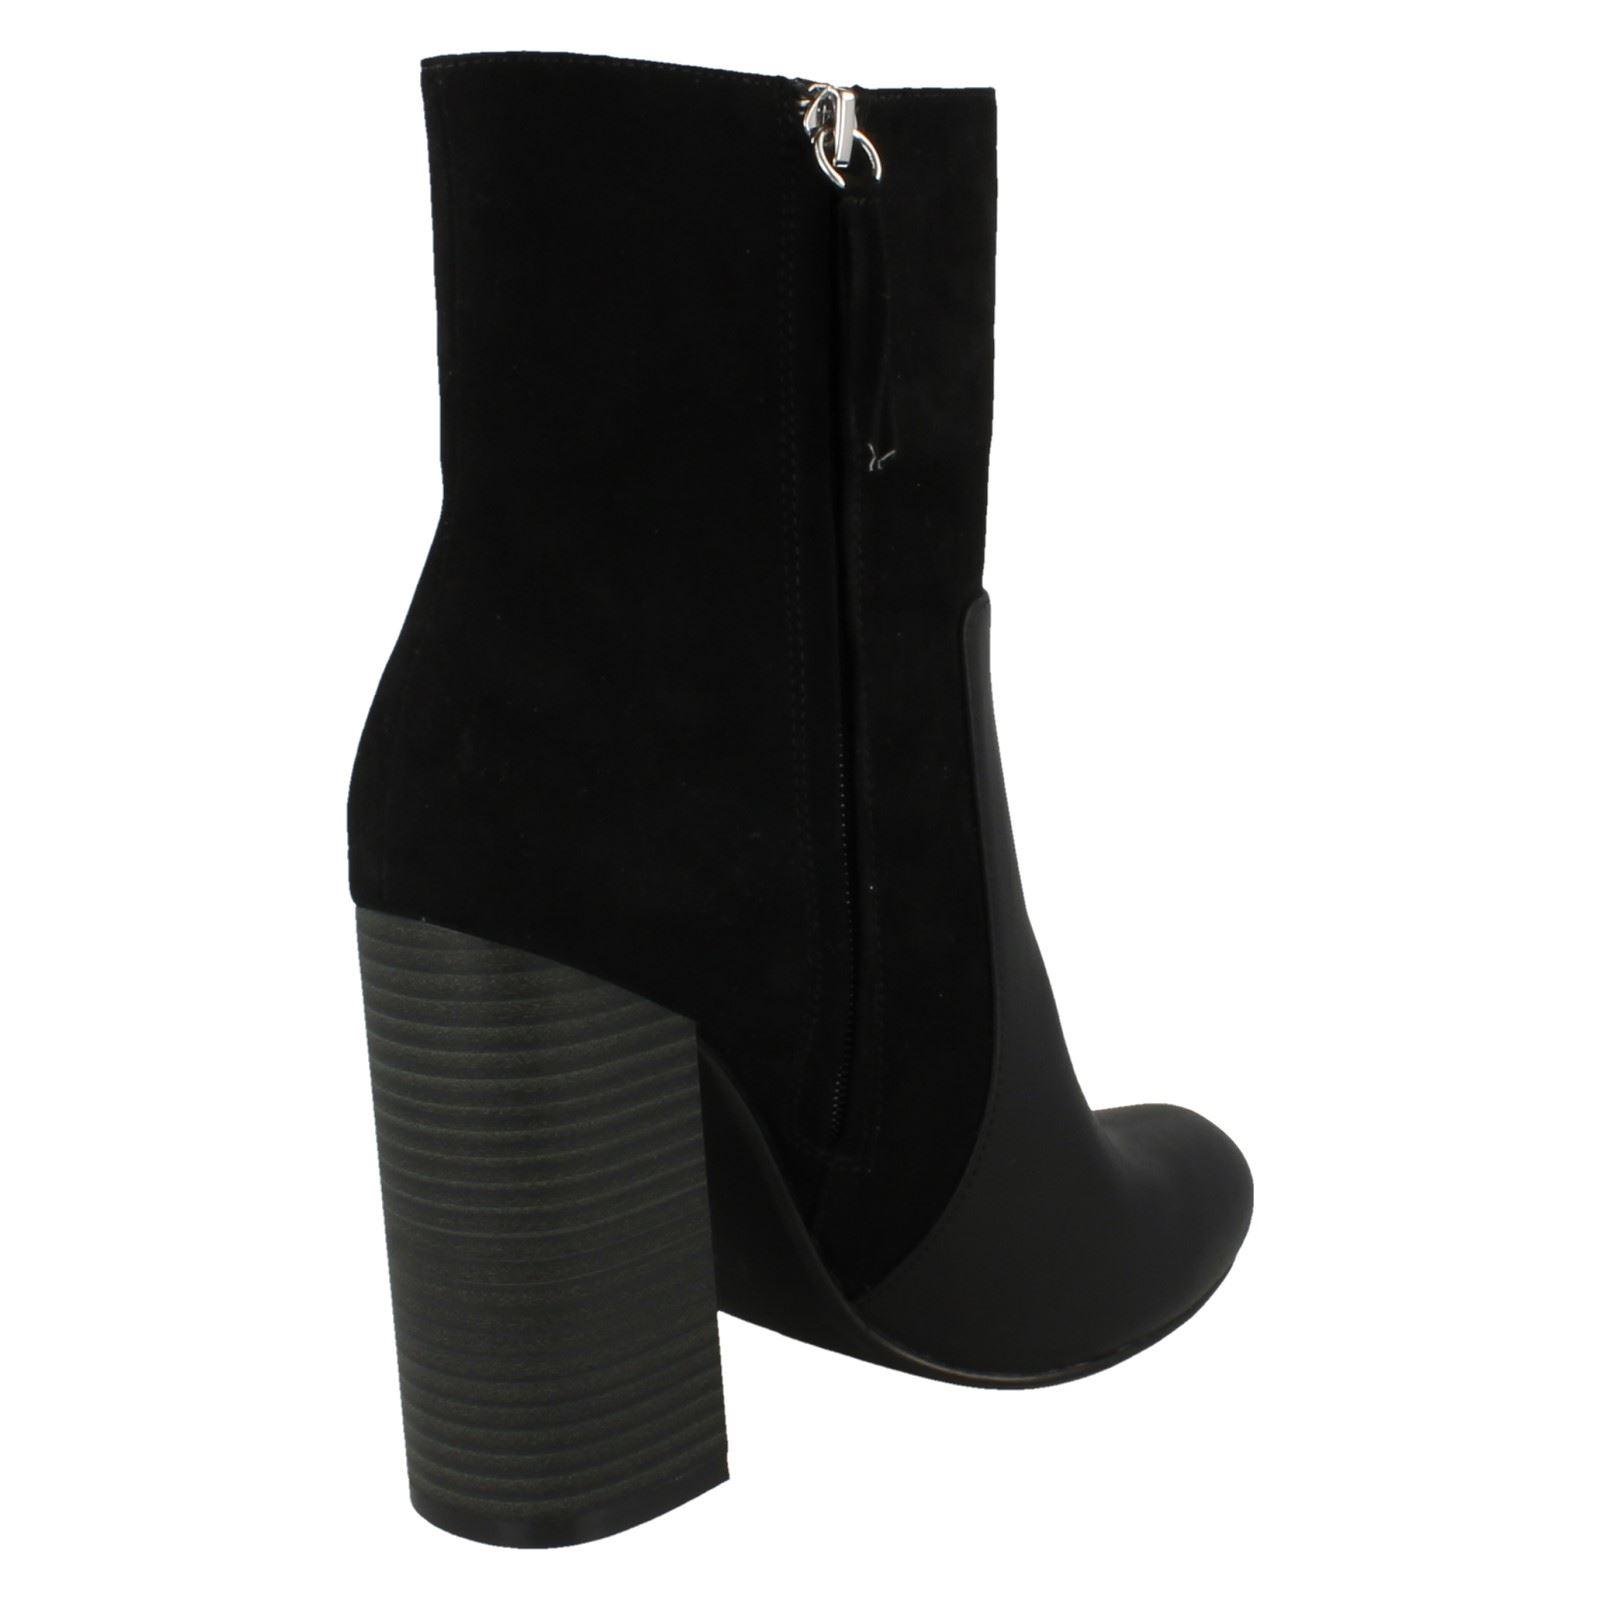 ANNE MICHELLE F5R0690 Ladies Burgundy Glitter Ankle Boot